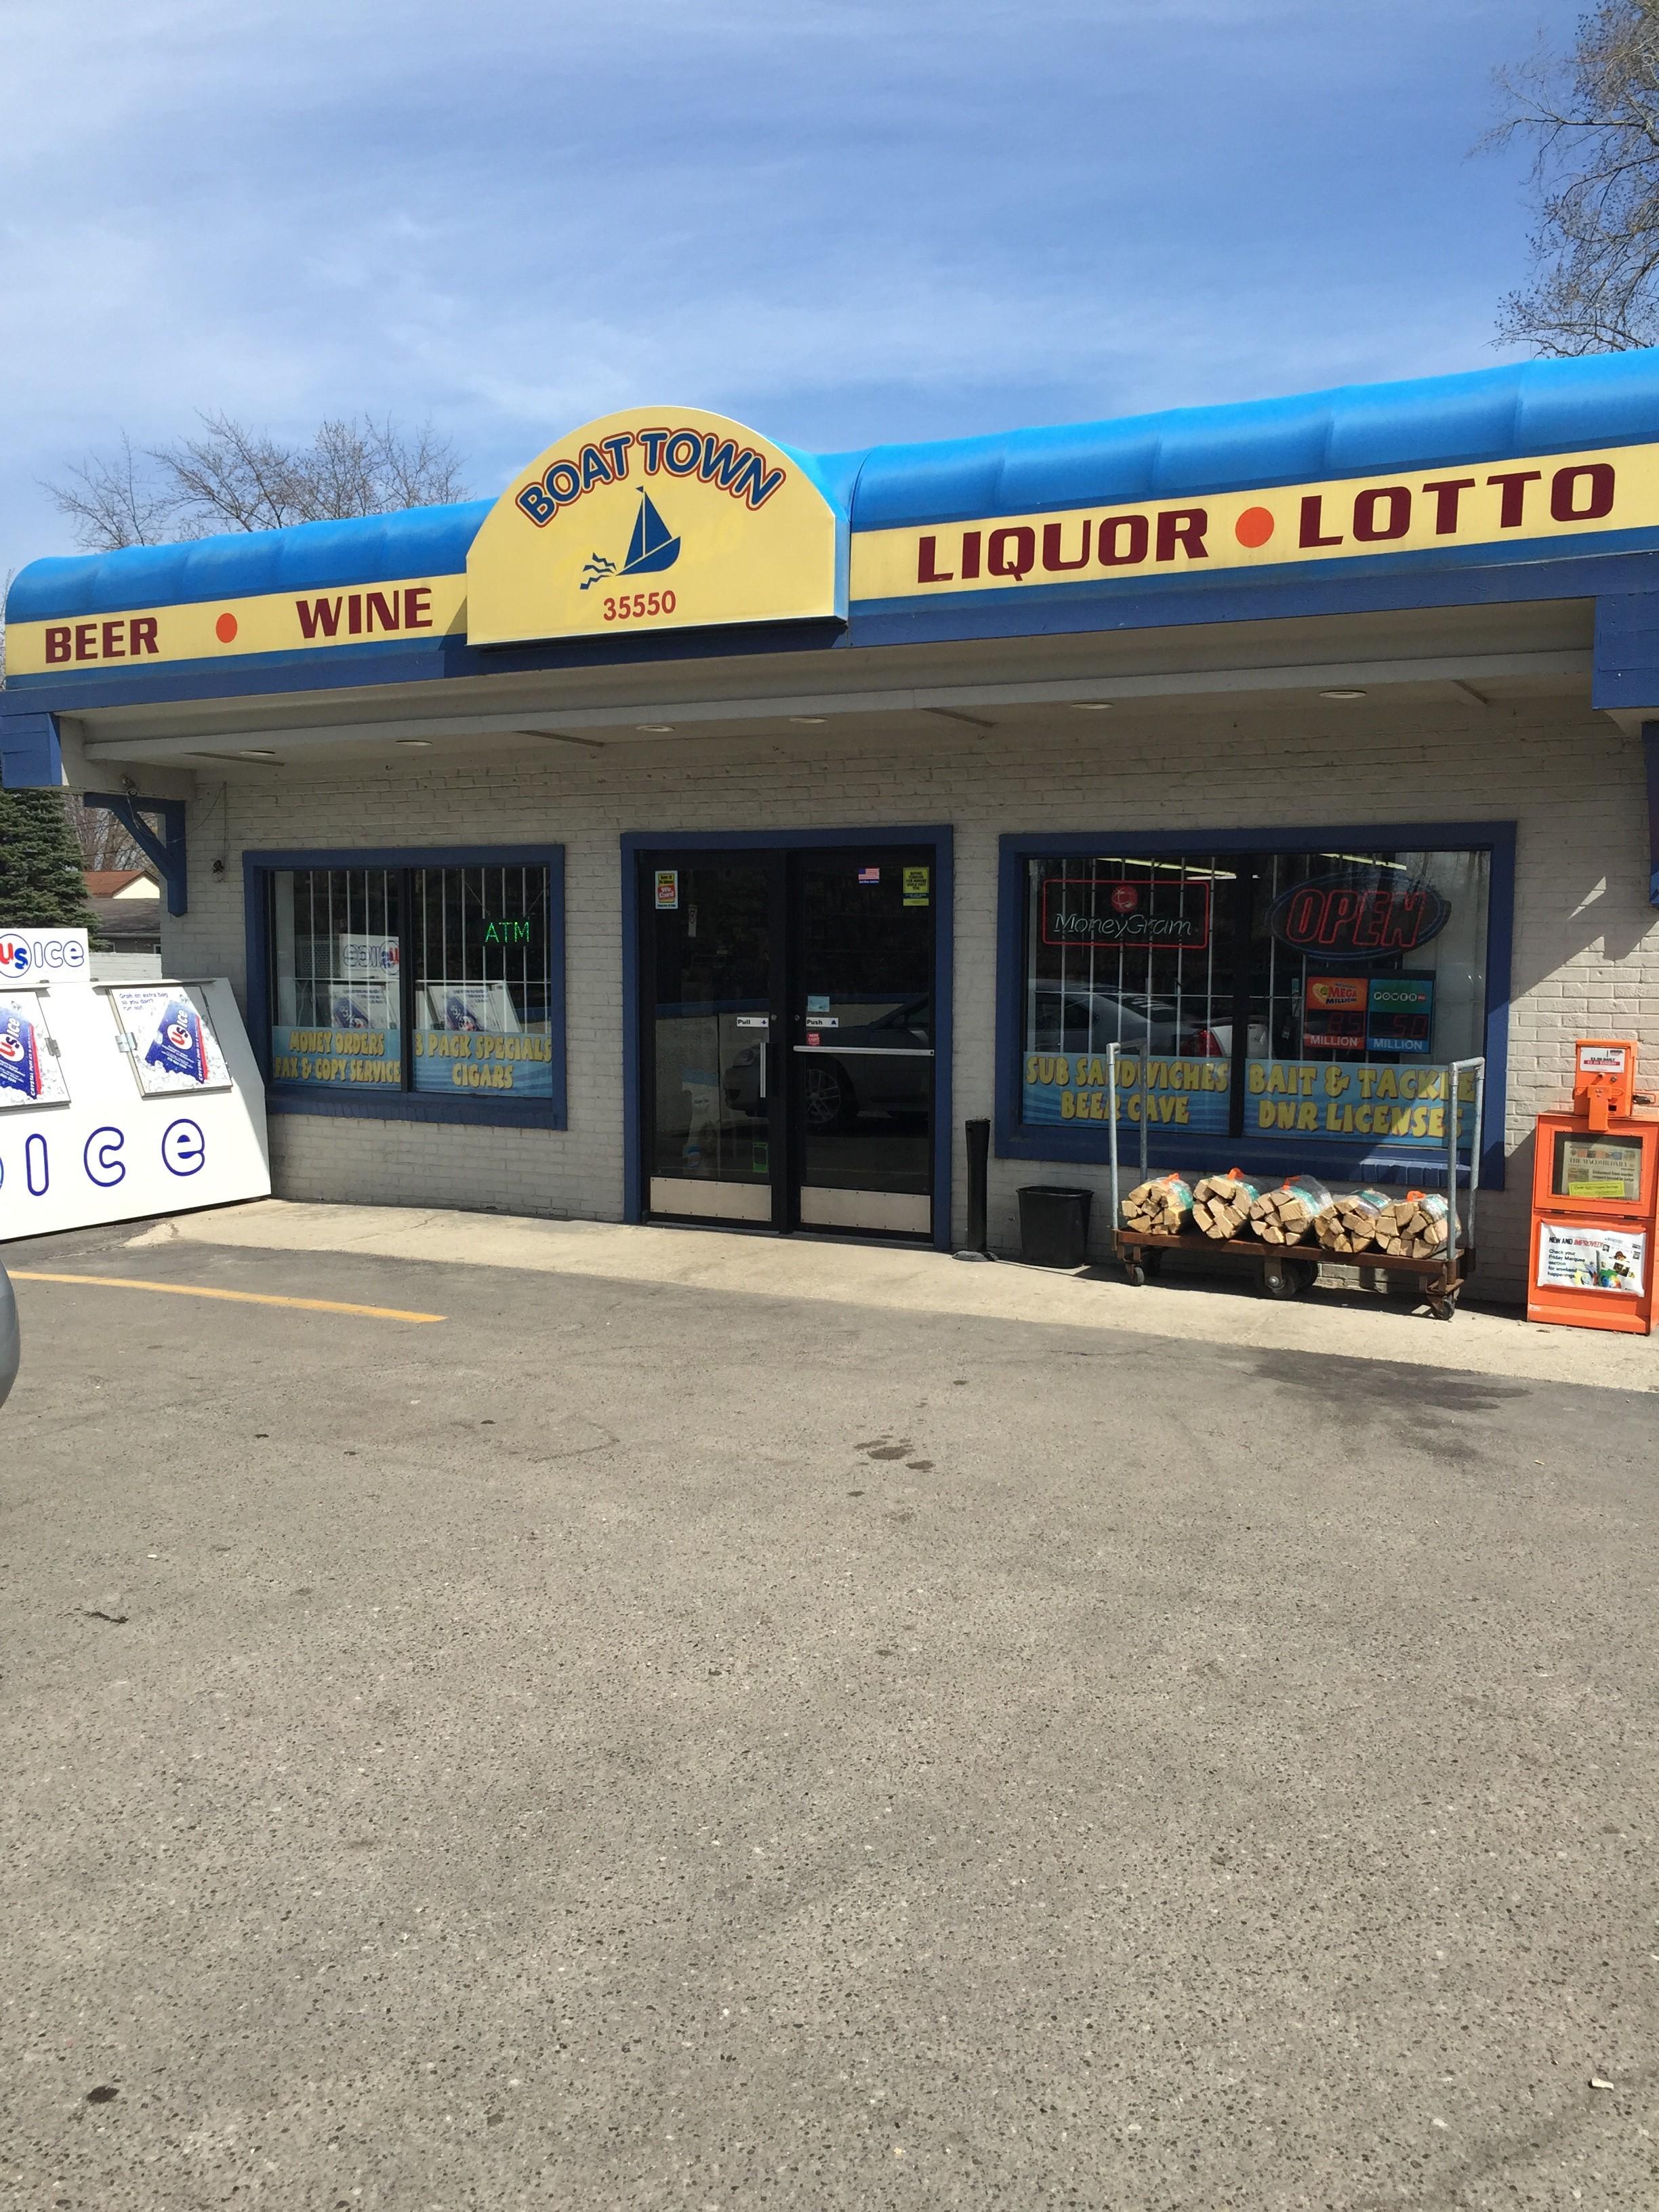 boat town liquor, harrison township